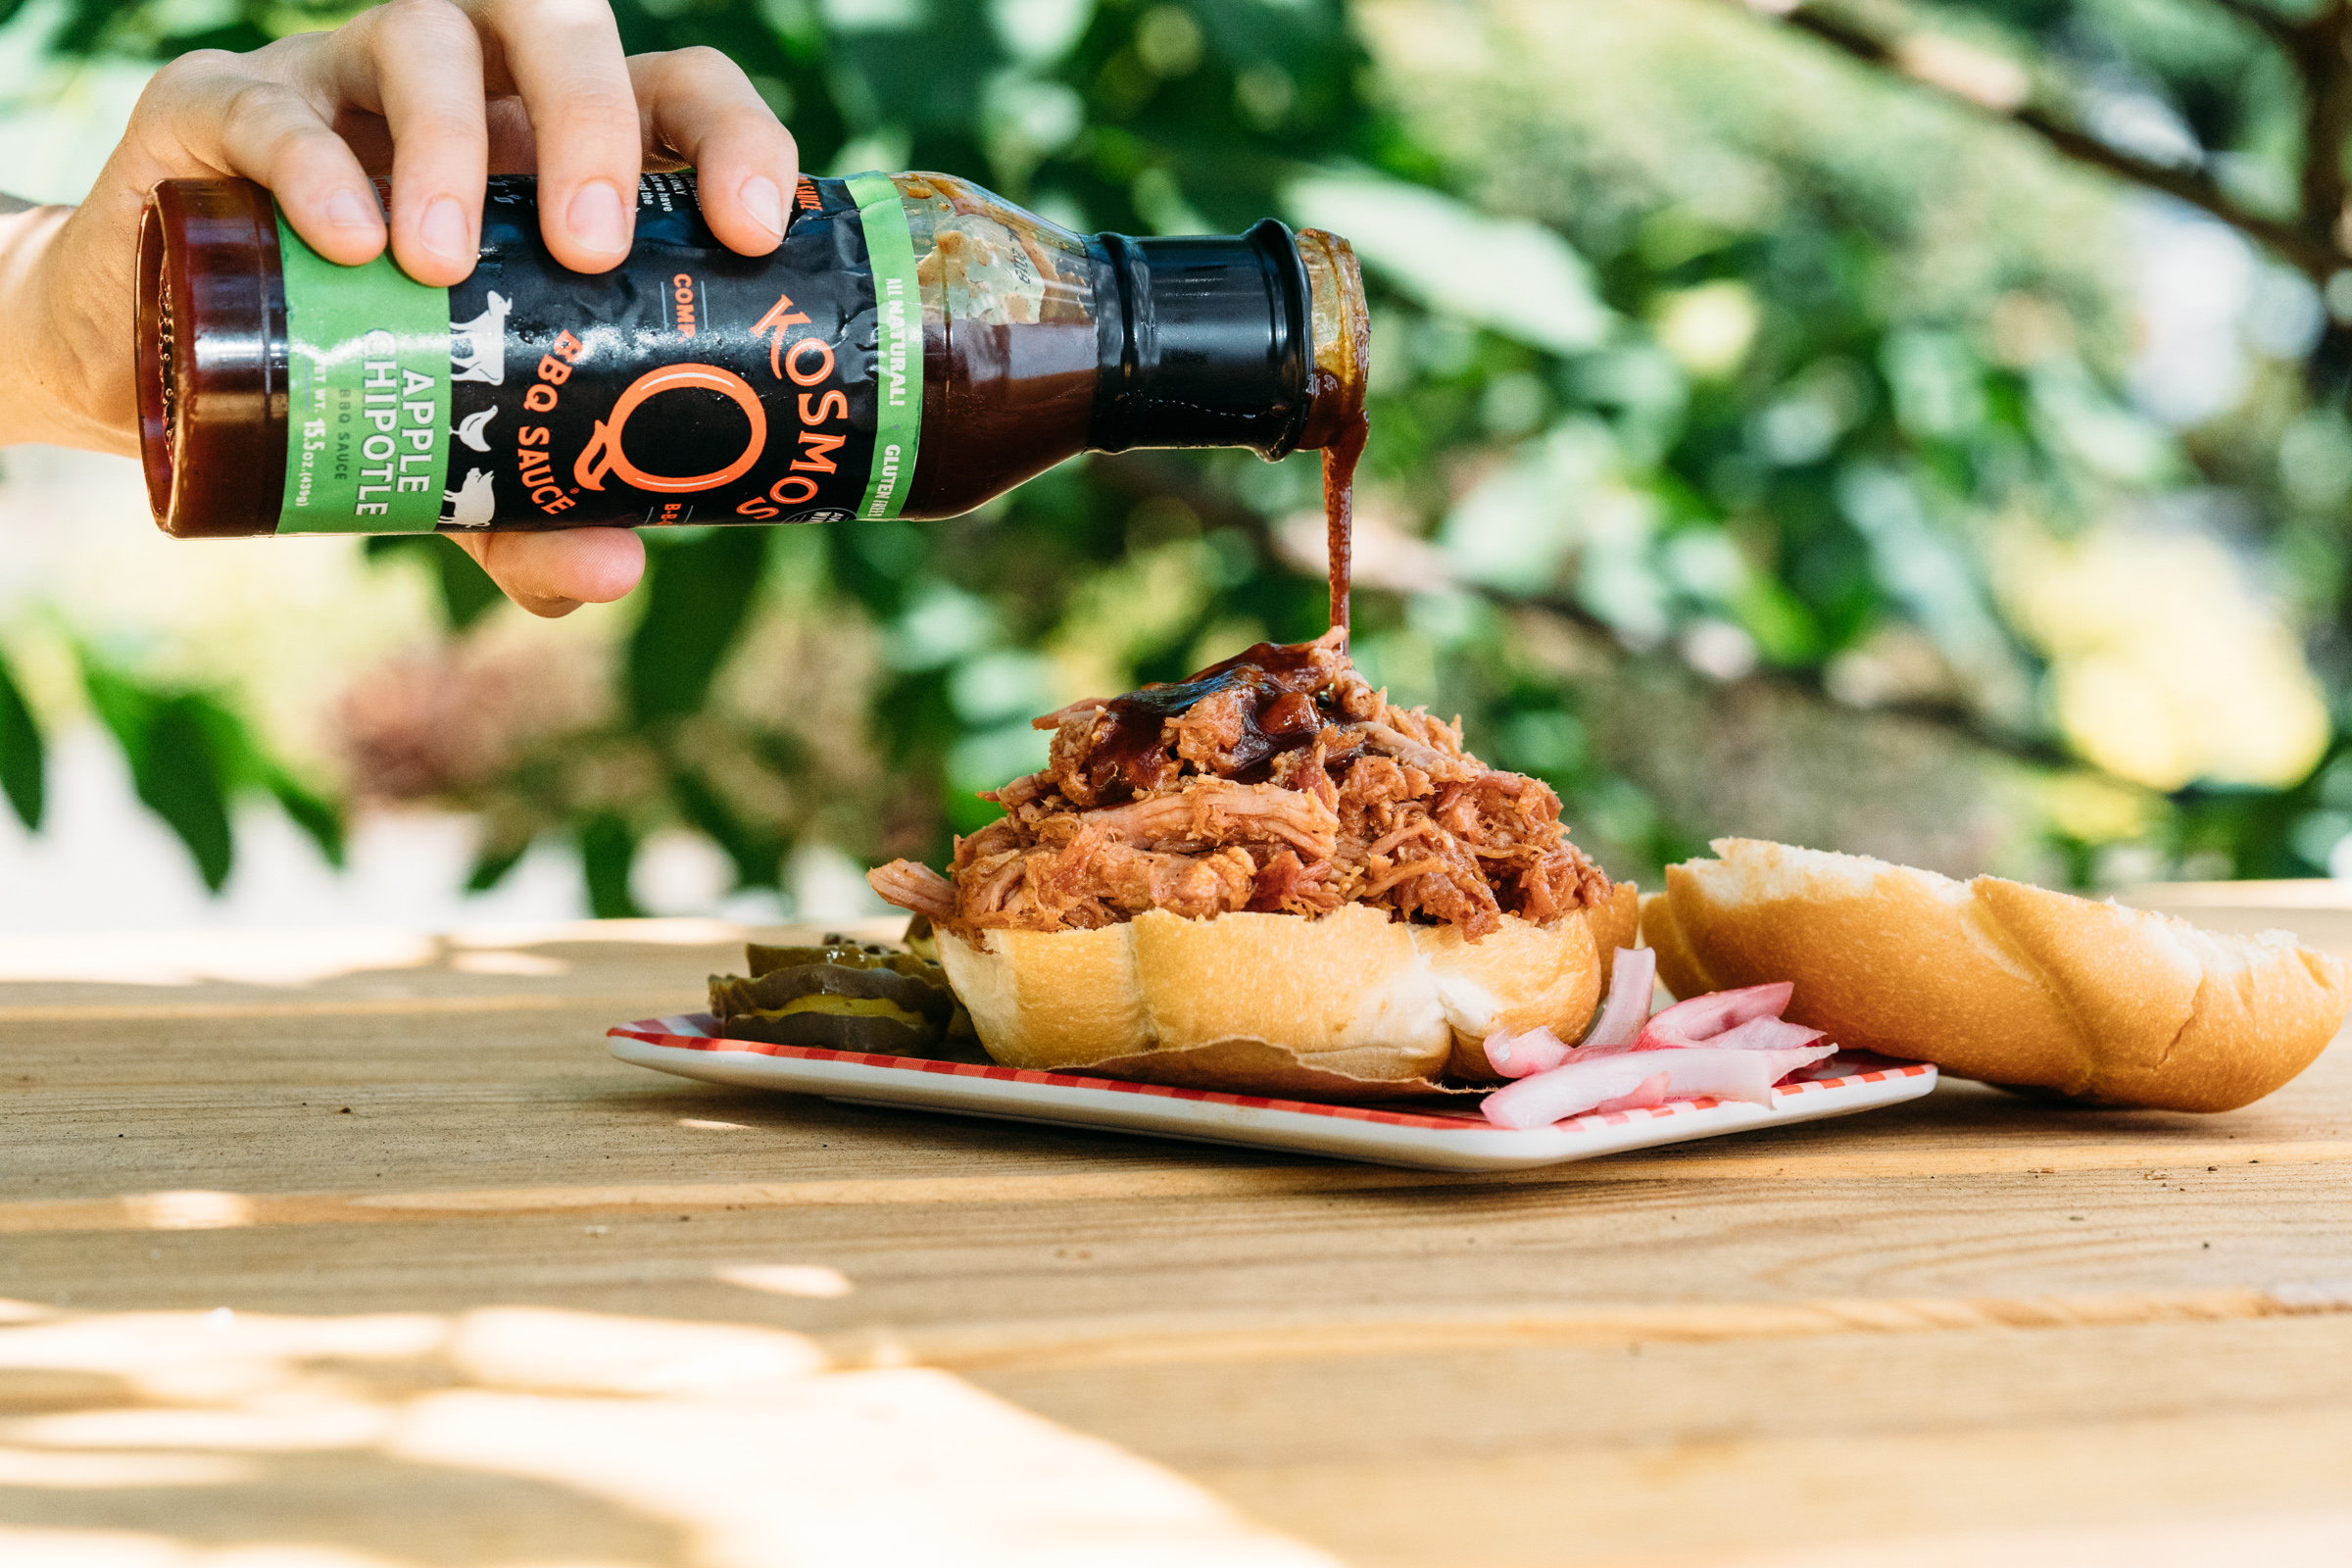 kosmos bbq sauce jeremy pawlowski portland oregon texas food photographer photography restaurant pulled pork